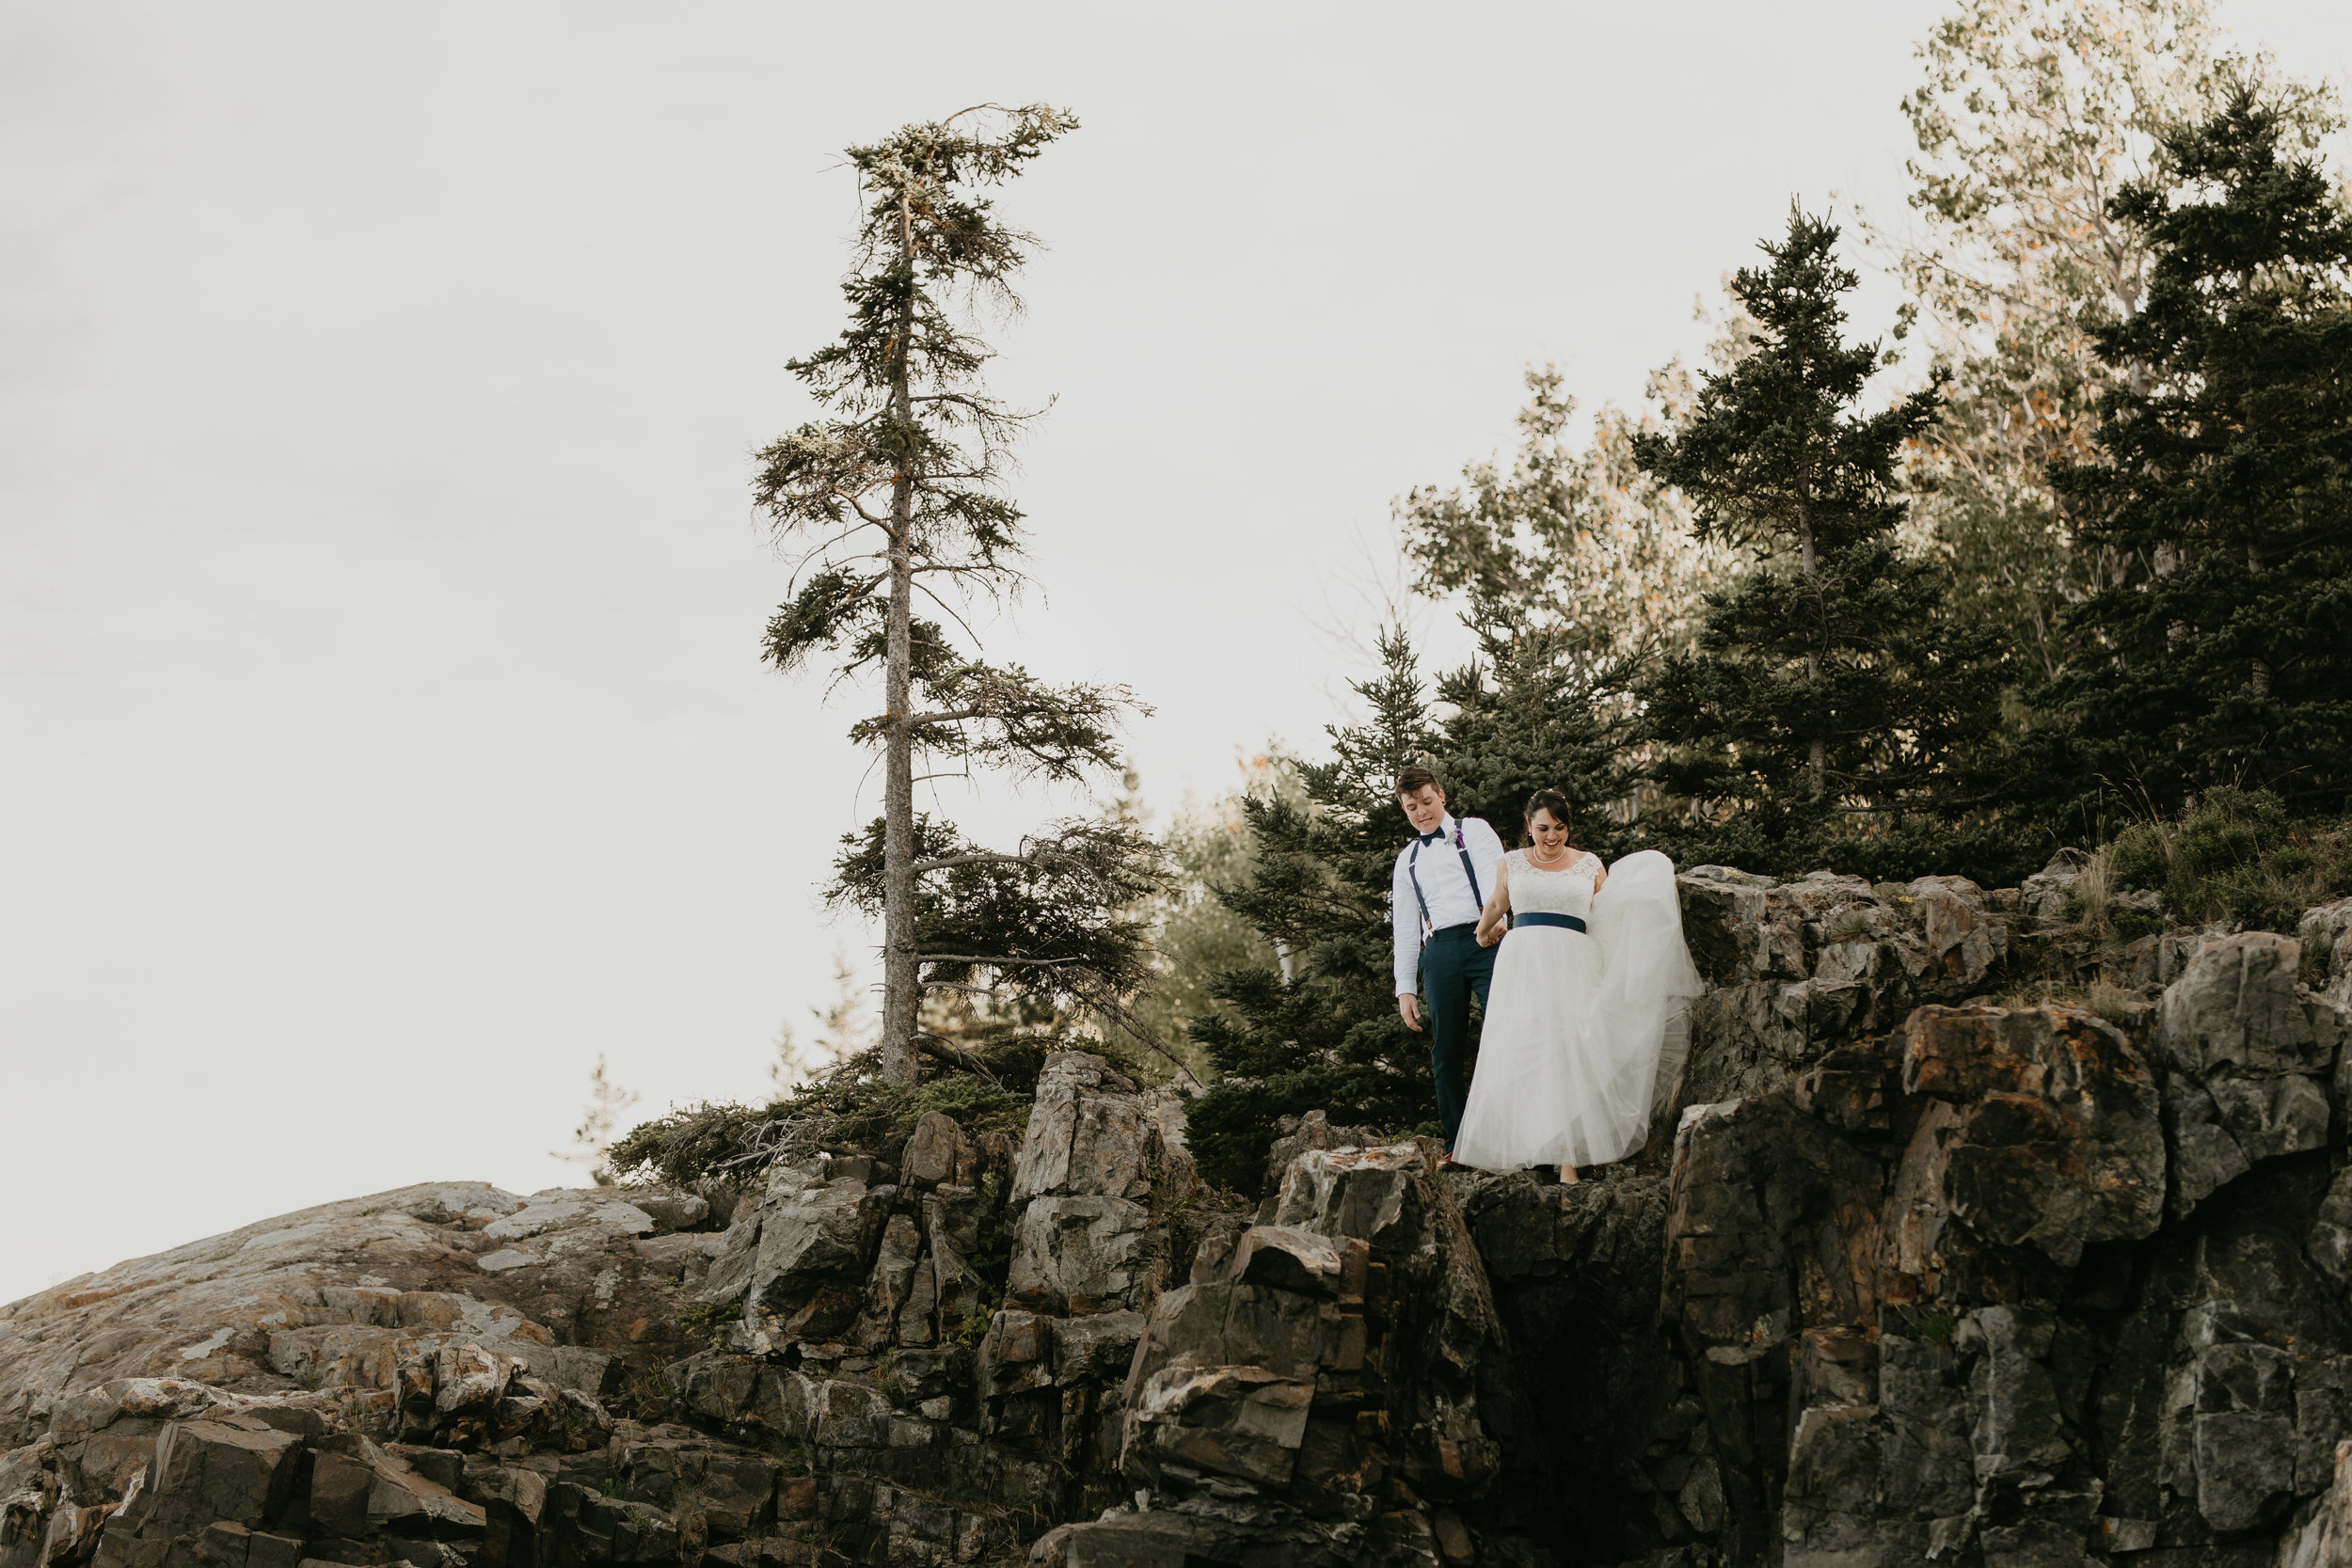 nicole-daacke-photography-Elopement-rocky-shoreline-coast-Acadia-National-Park-elopement-photographer-inspiration-maine-elopement-otter-cliffs-schoonic-head-point-34.jpg